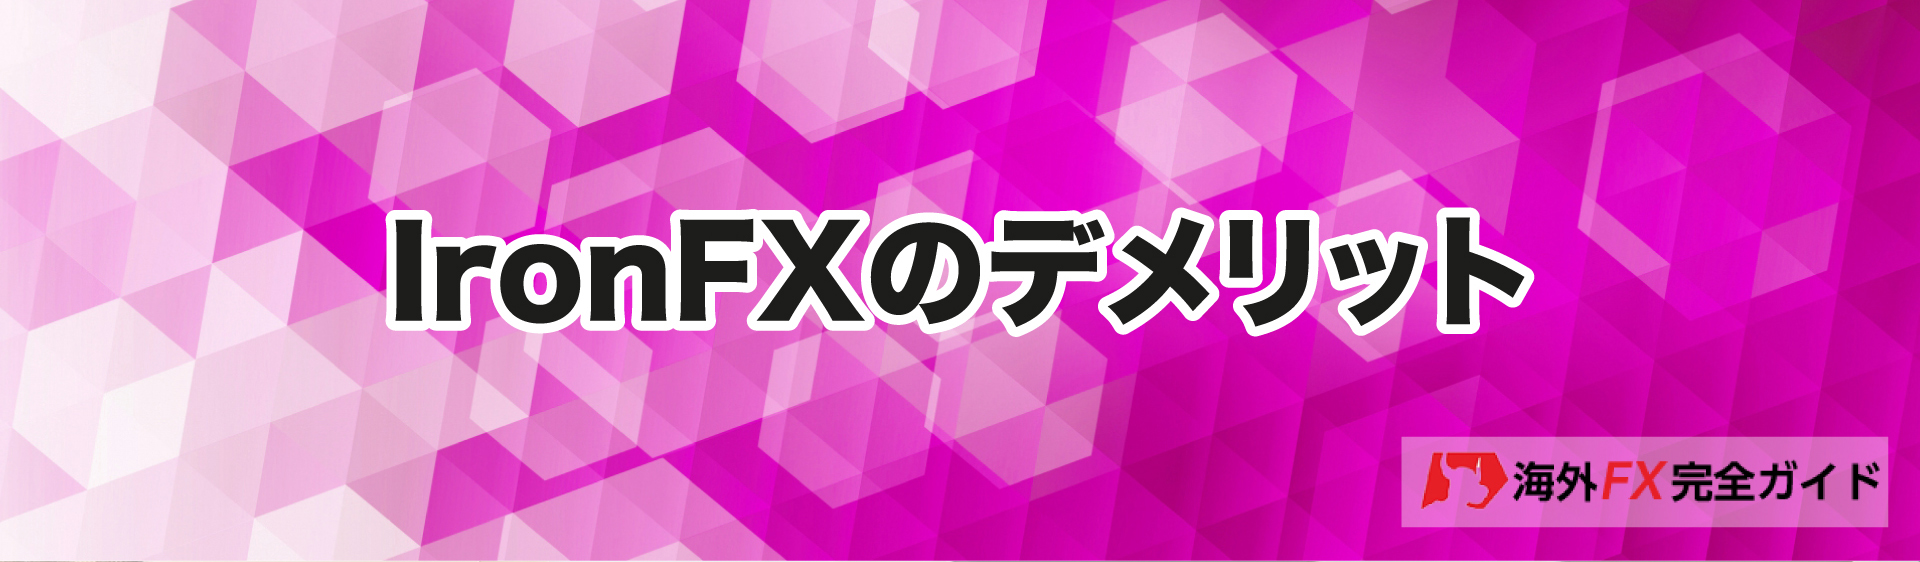 IronFX-Head-2-5